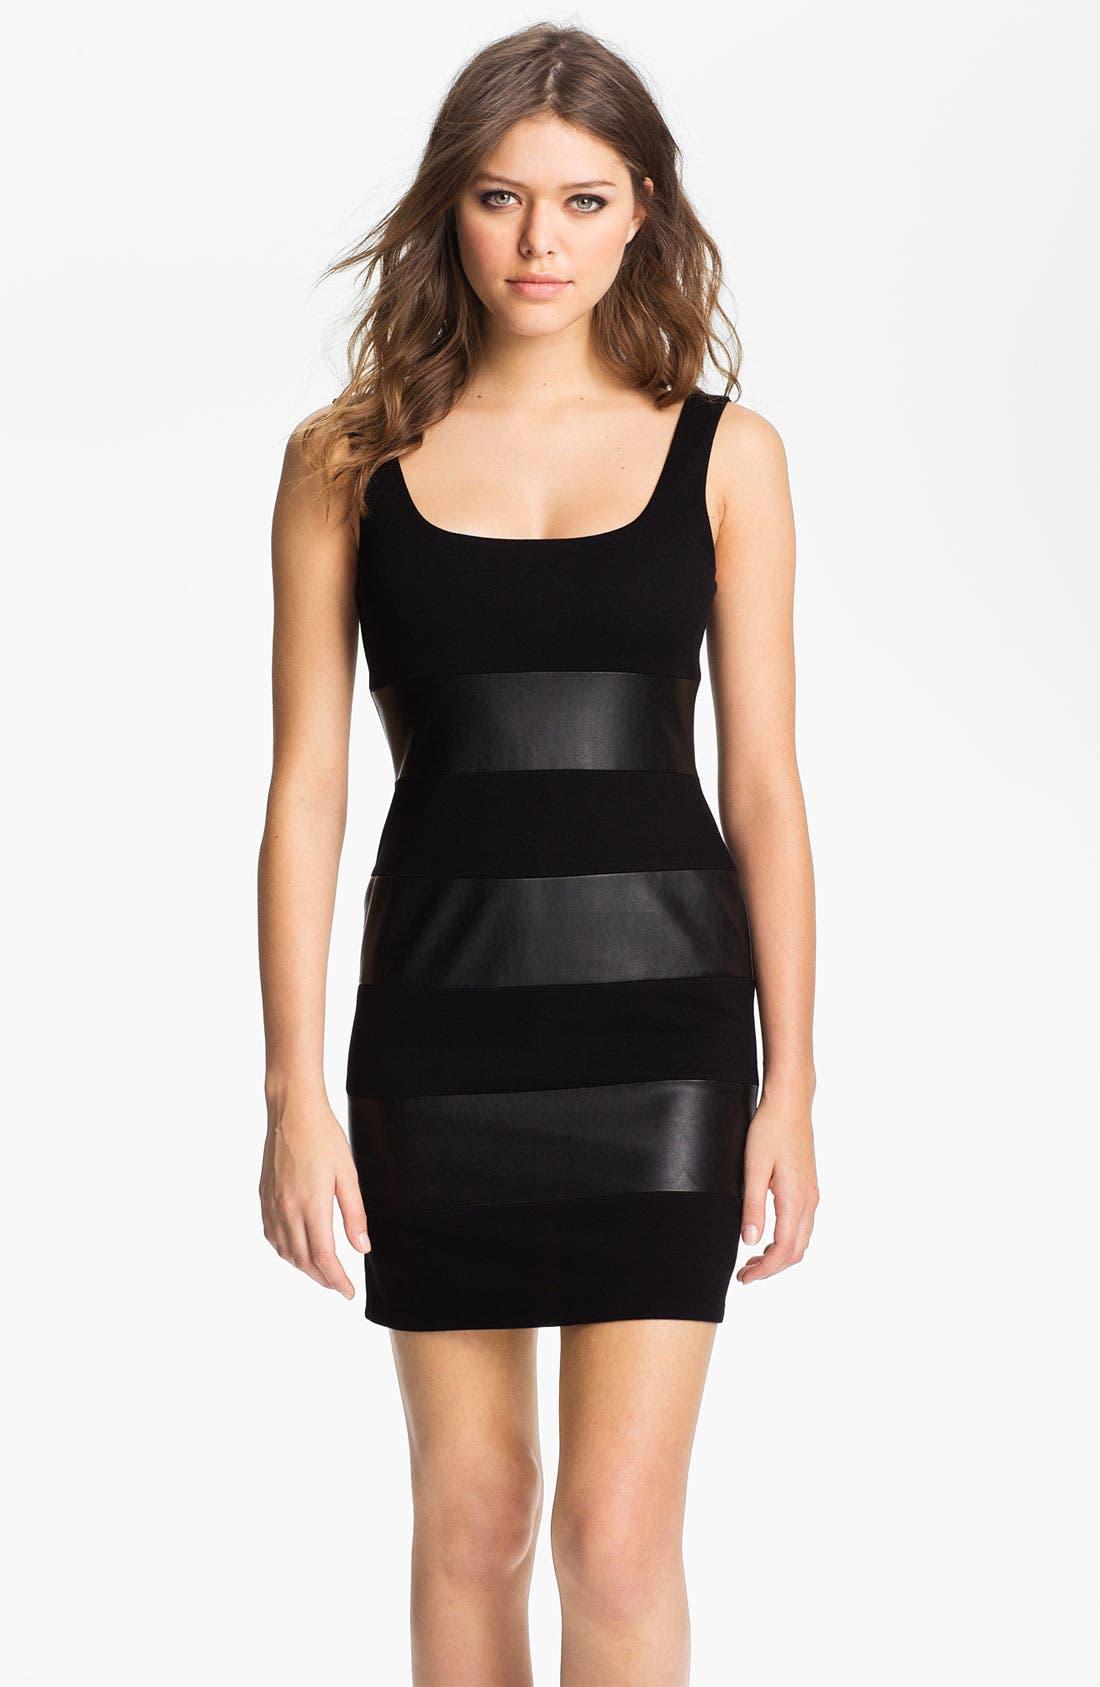 Alternate Image 1 Selected - B44 Dressed by Bailey 44 'Little Black Dress' Faux Leather Stripe Tank Dress